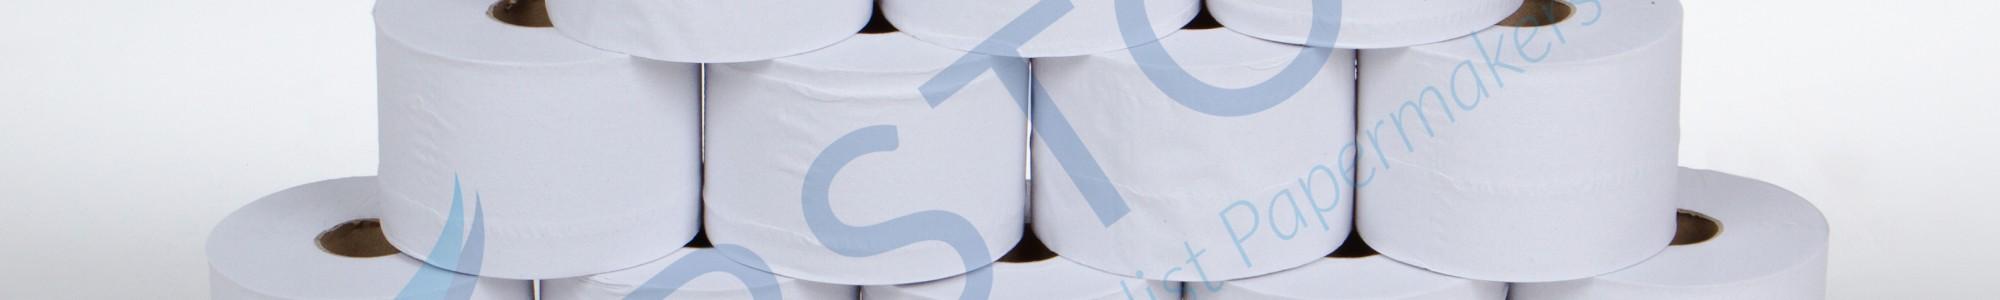 KTTR - Fourstones Kattan Twin Roll System Paper Product